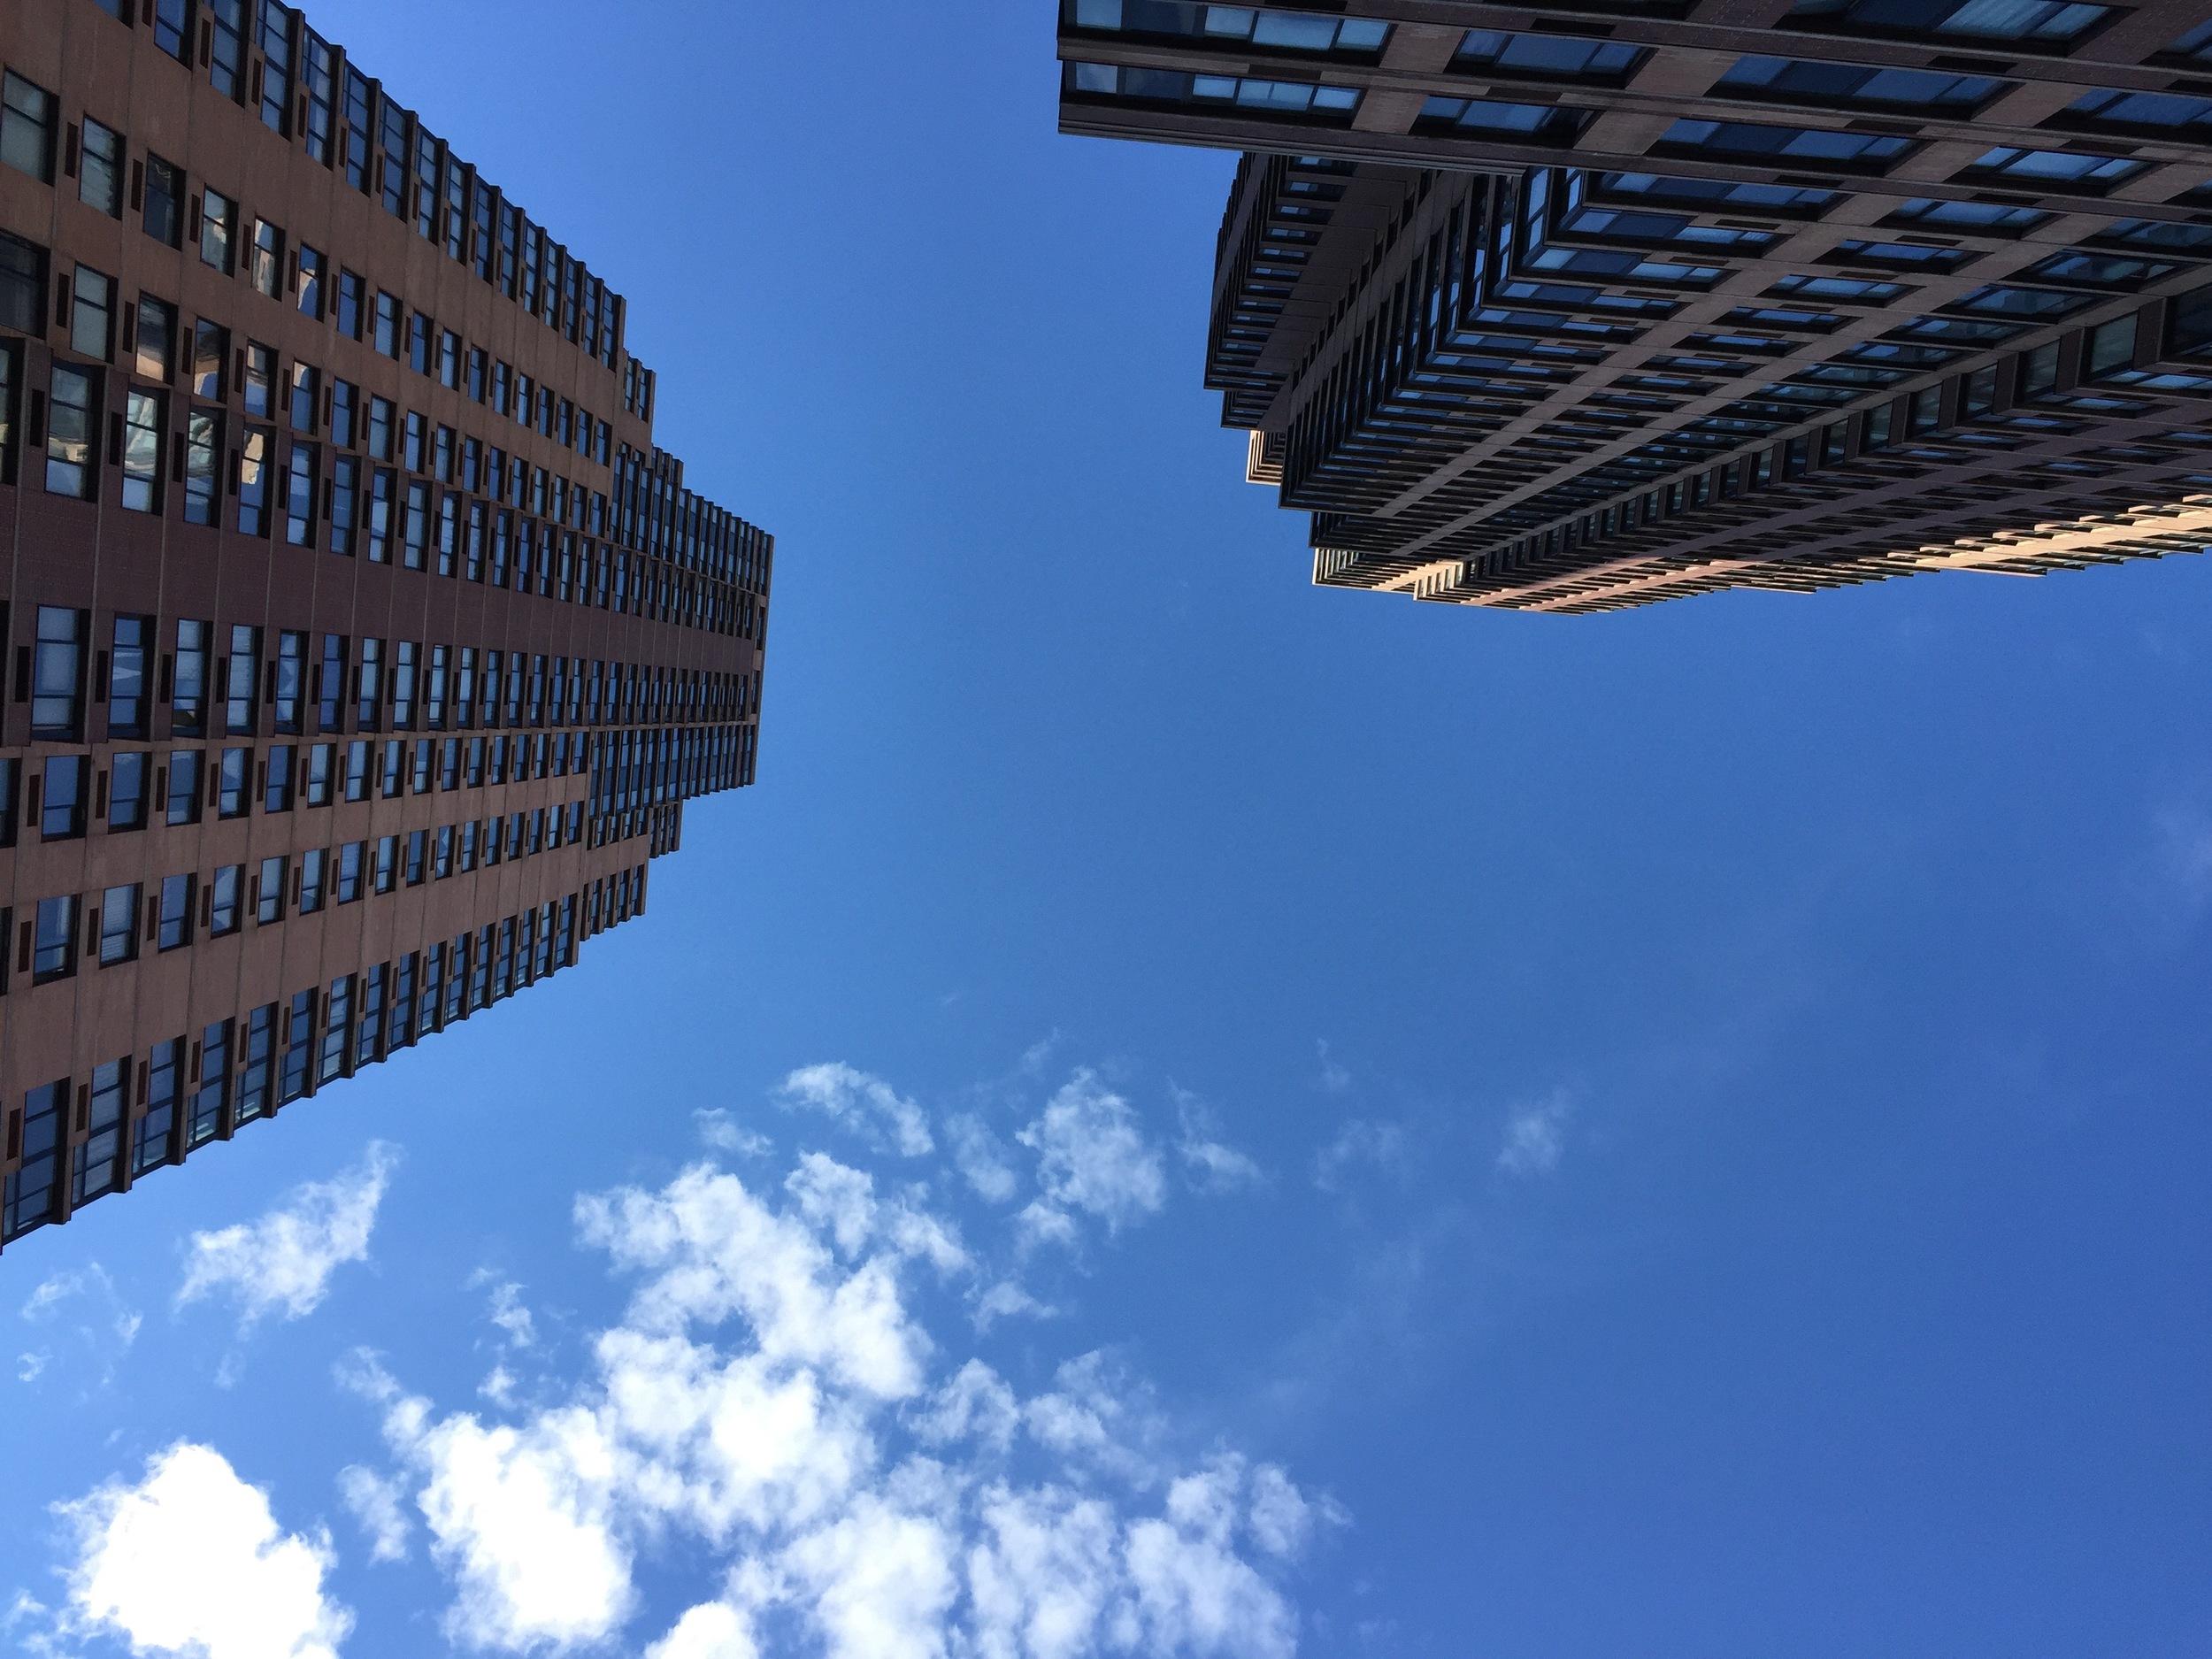 Manhattan from the ground up